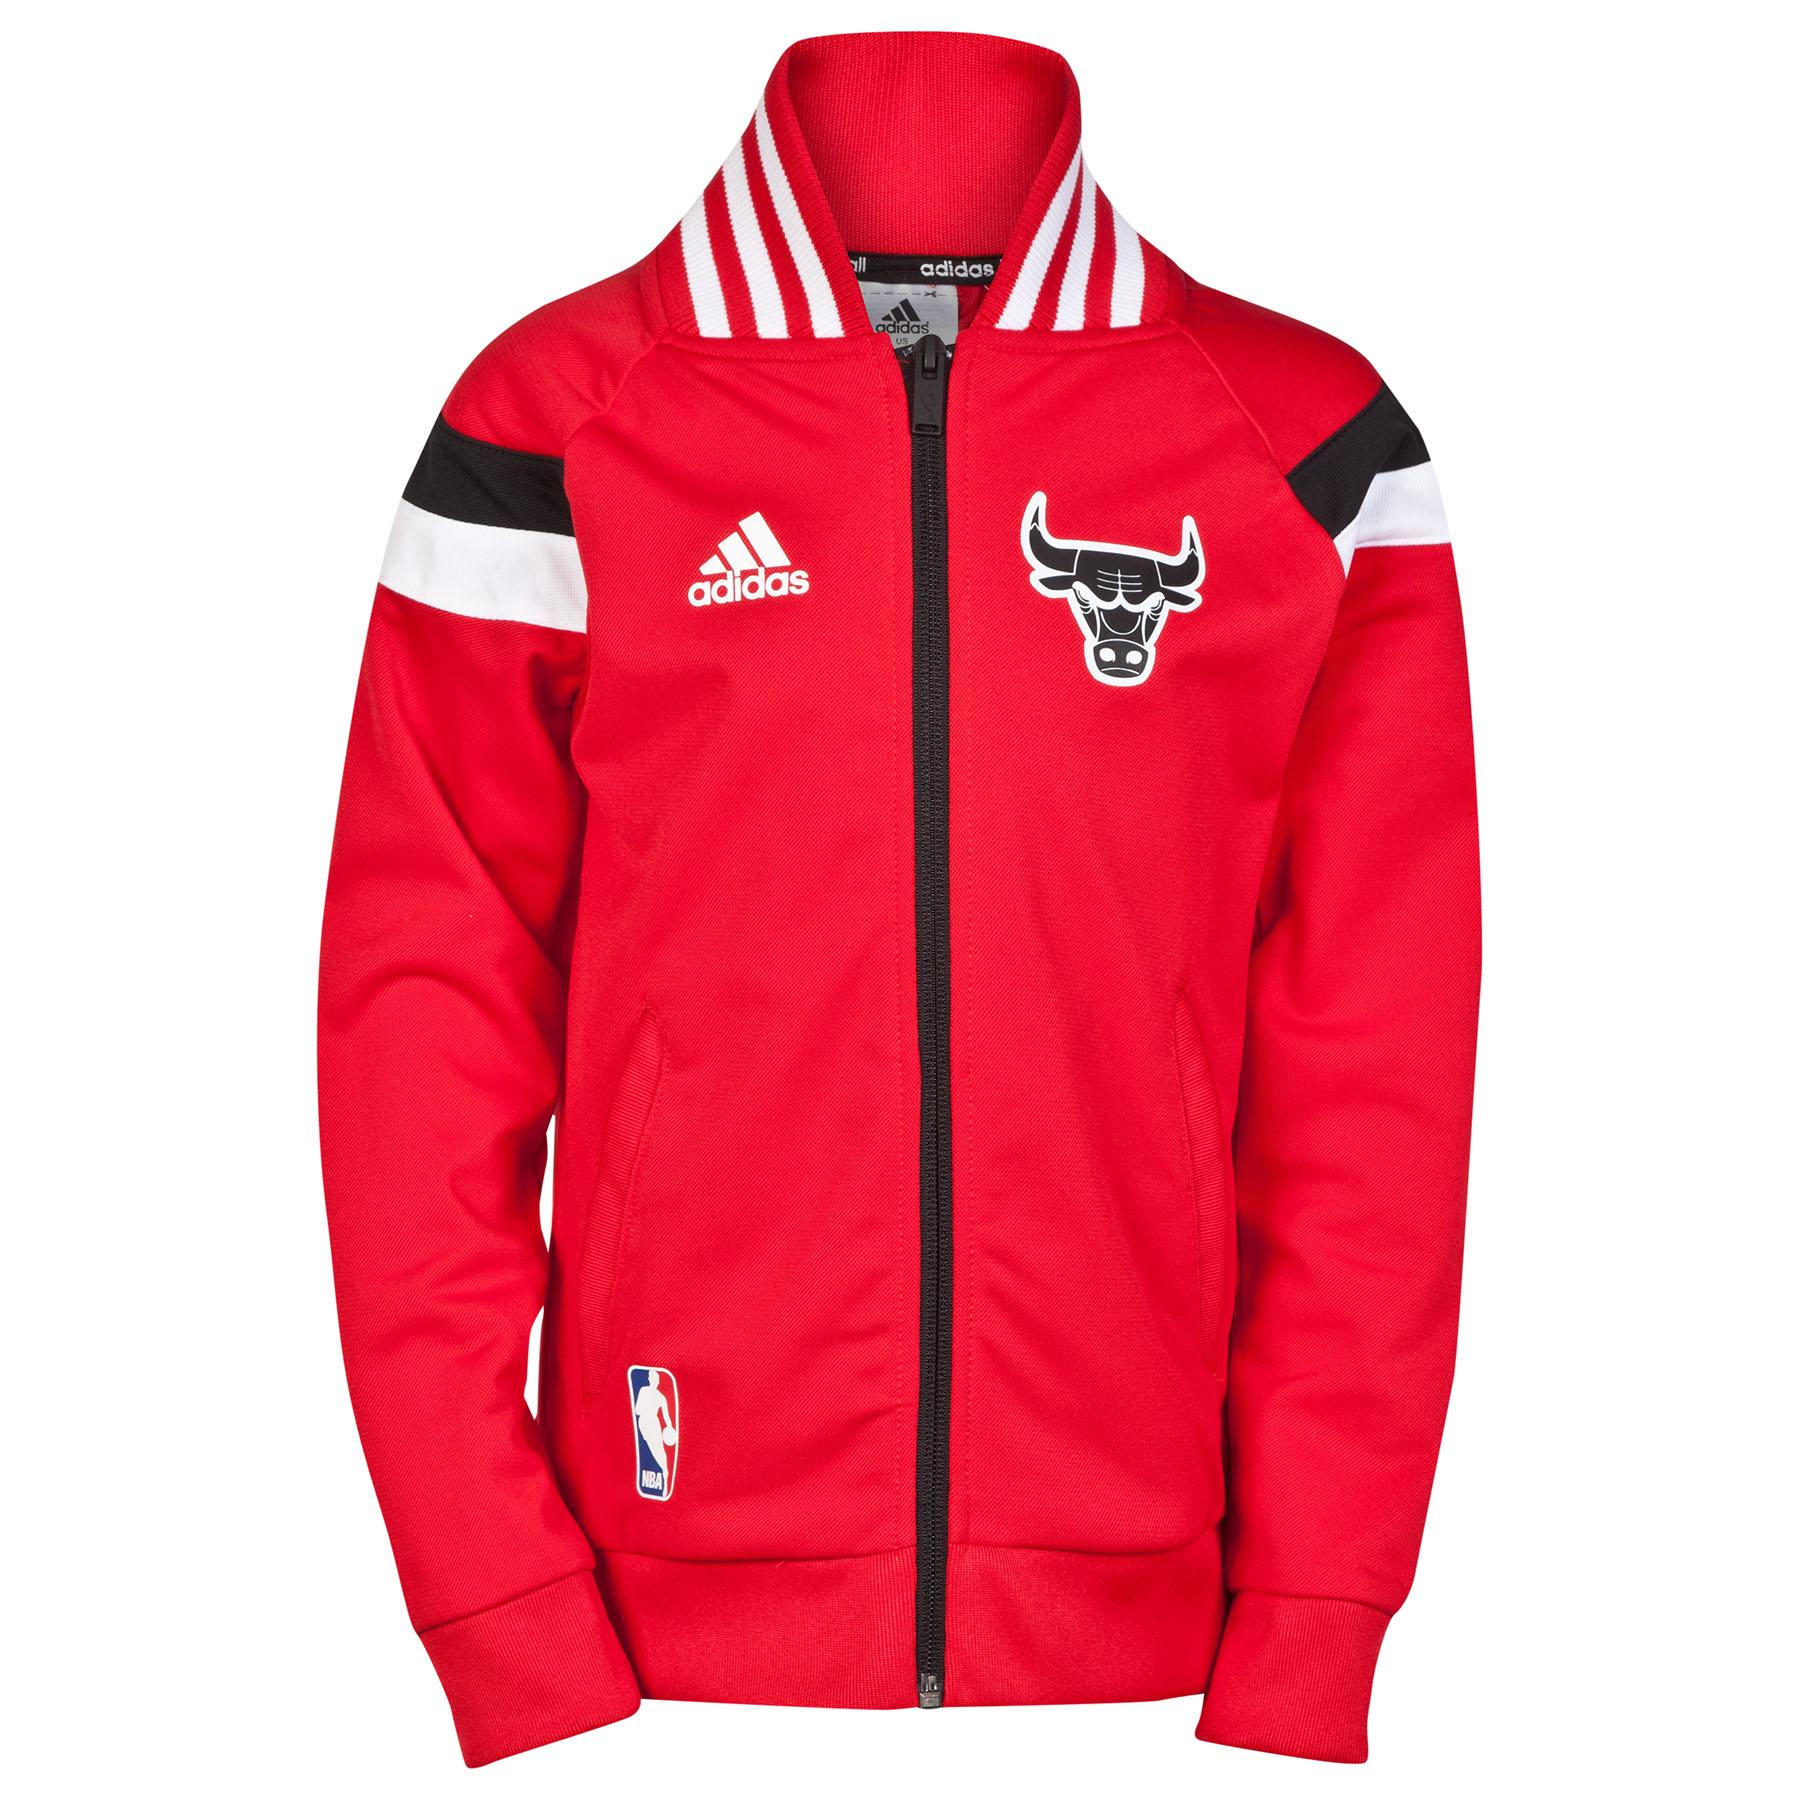 Chicago Bulls Winter Hoops Anthem Jacket - Junior Red